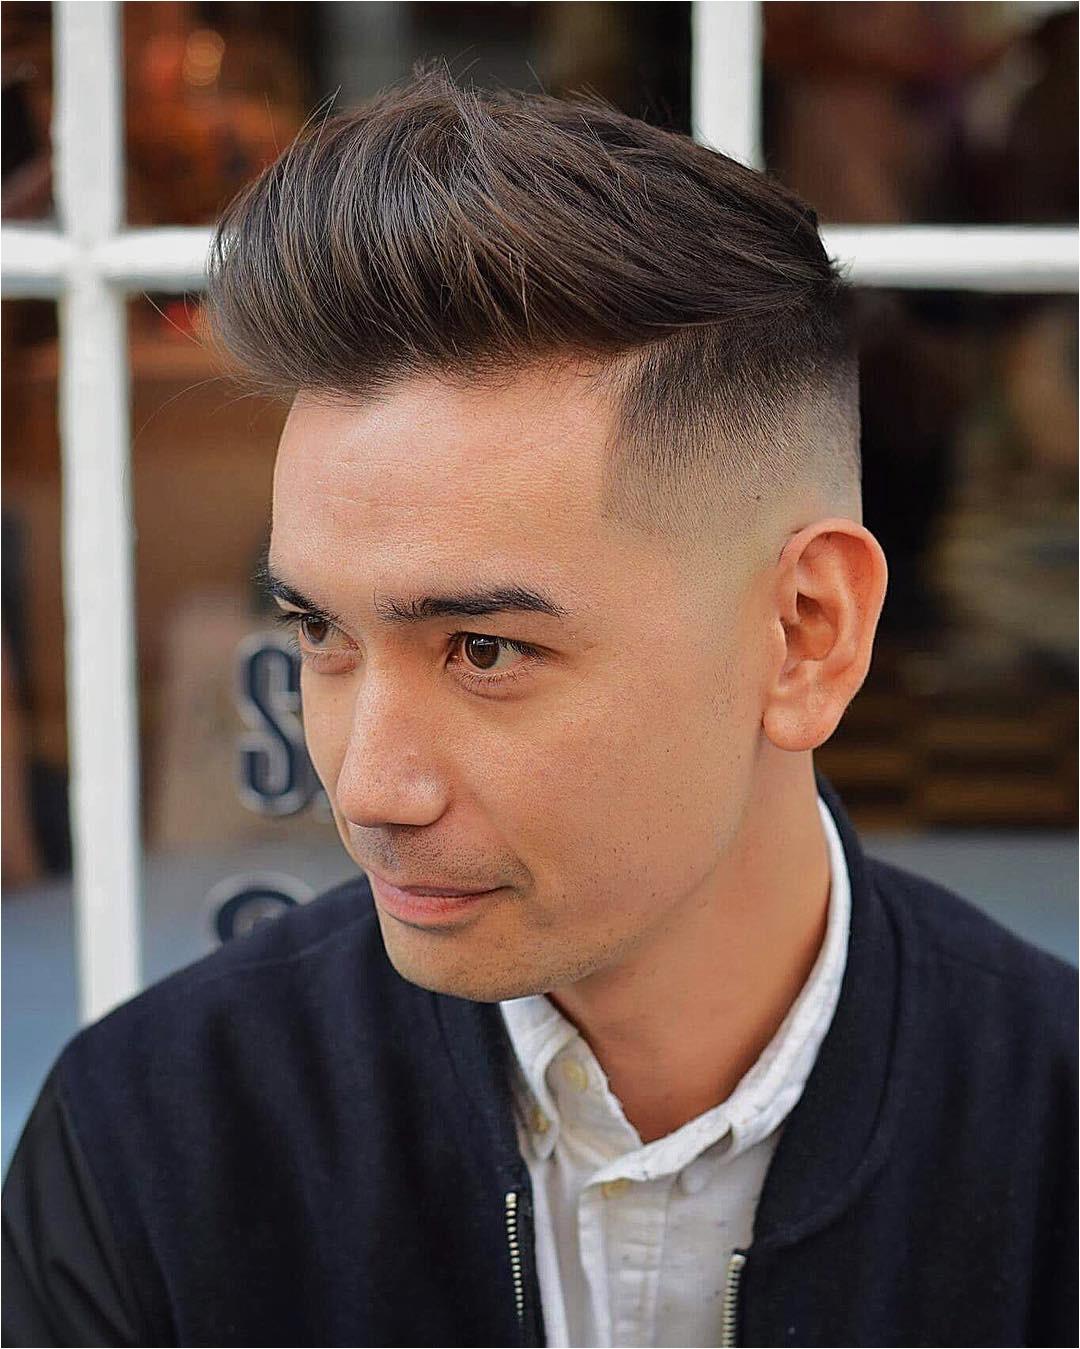 Best Mens Haircut for Receding Hairline Best Men S Haircuts Hairstyles for A Receding Hairline